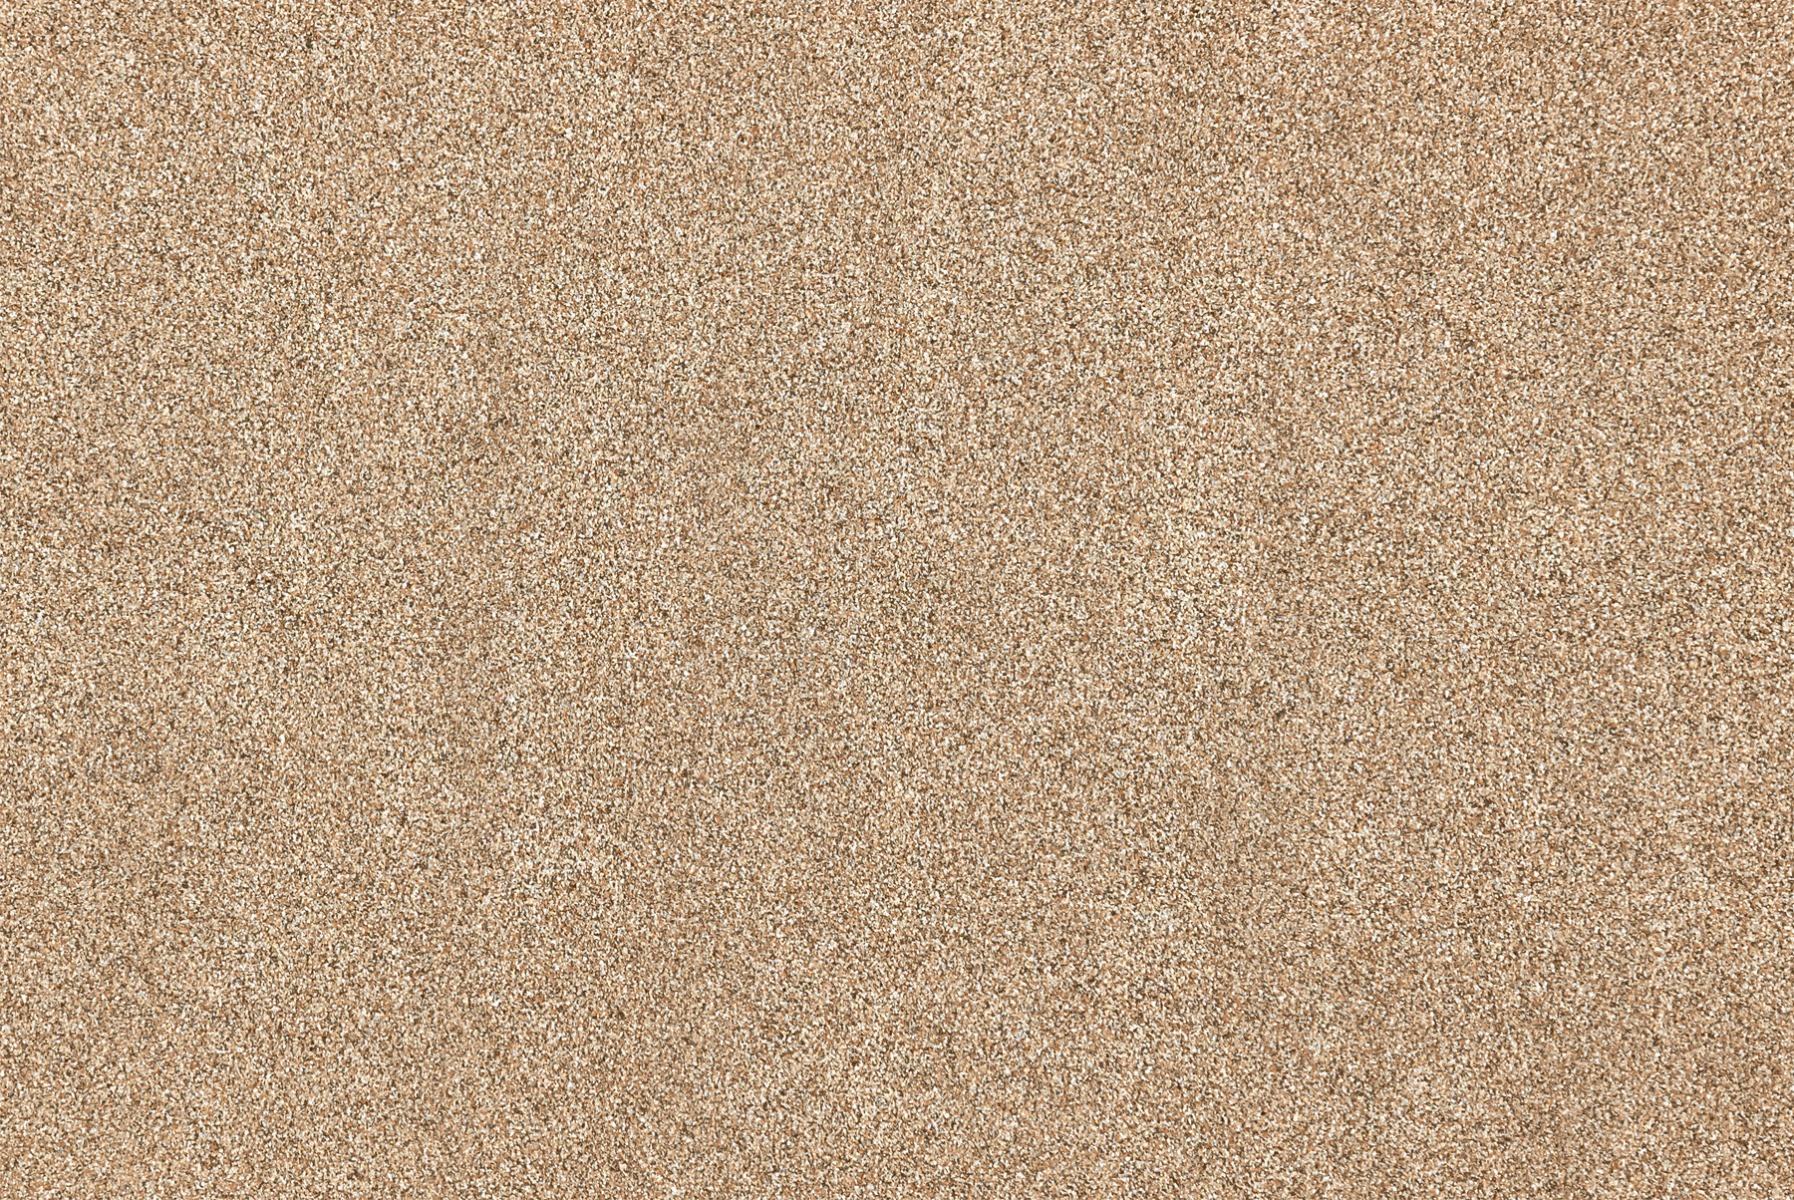 GFT SPB Sand Sandune